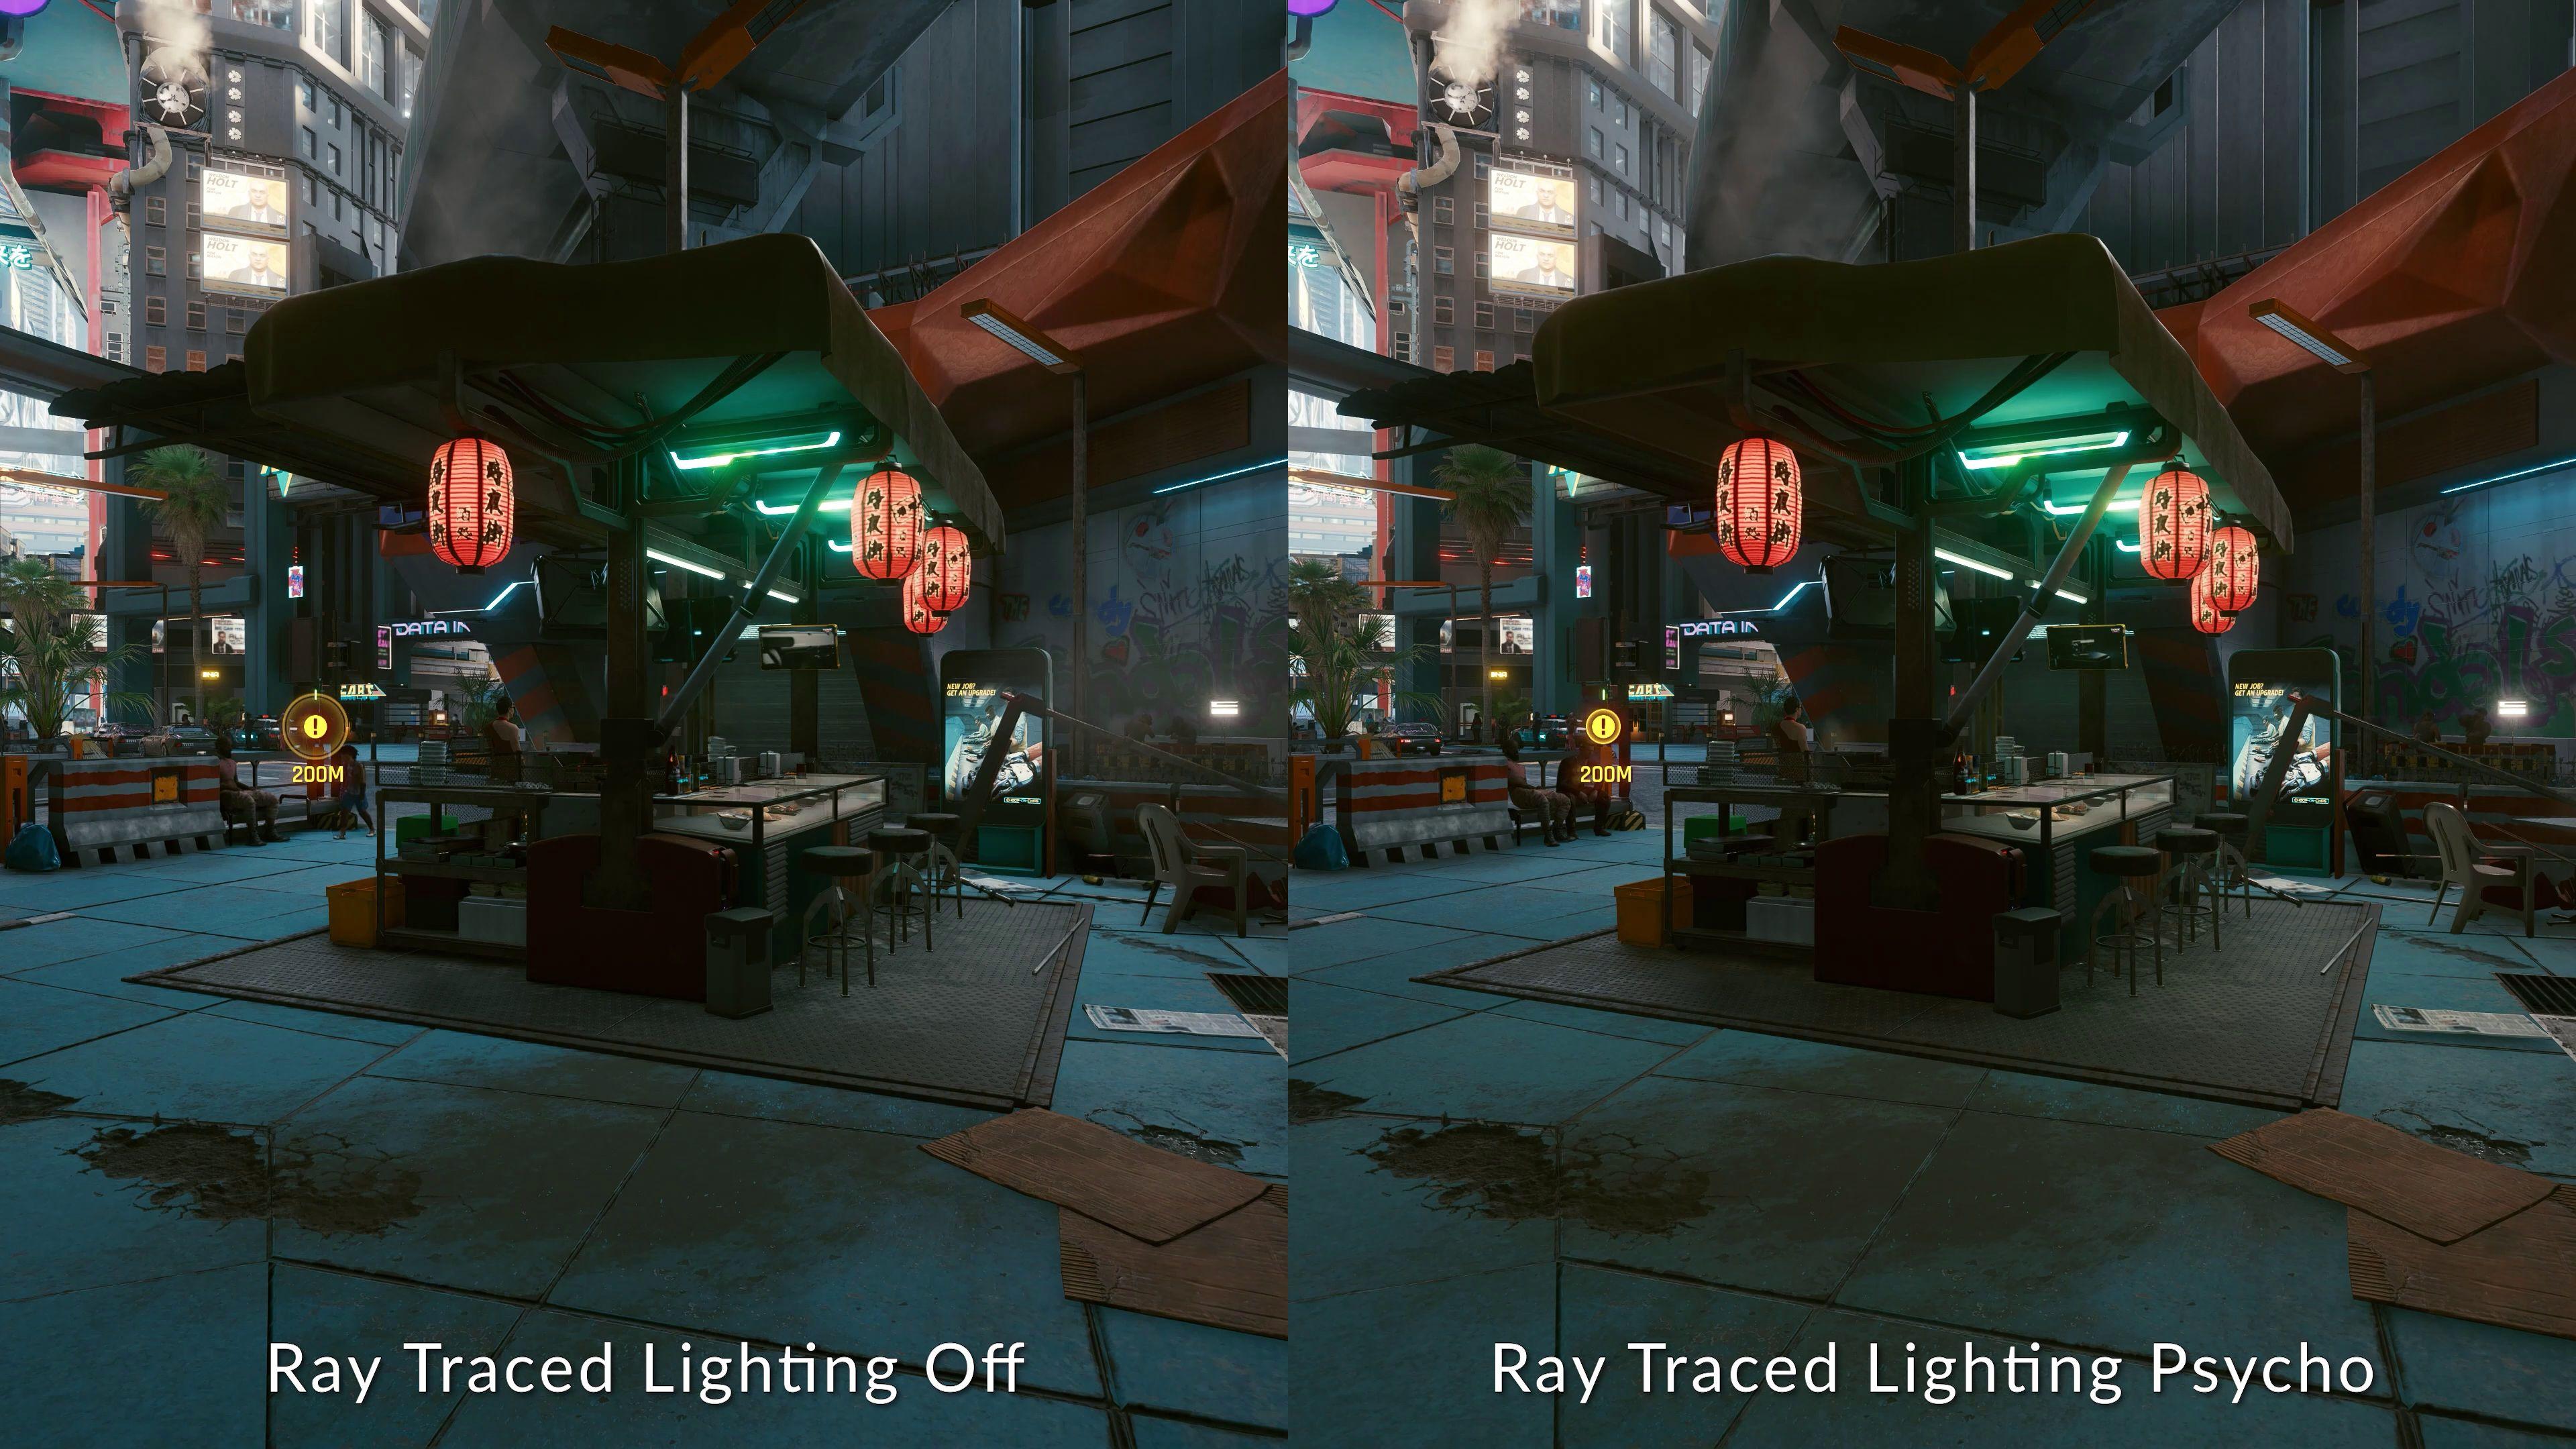 cyberpunk 2077 sky lighting